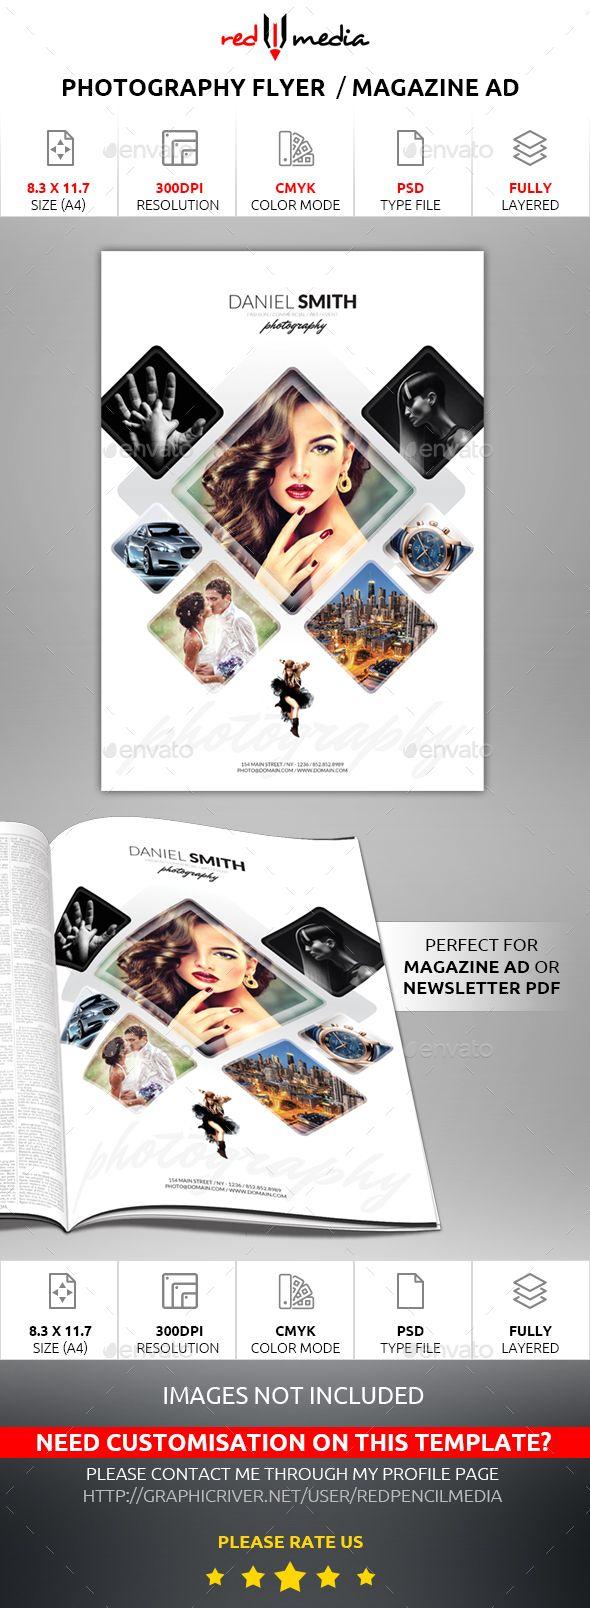 Photography Flyer / Magazine AD | Photography flyer, Flyer printing ...